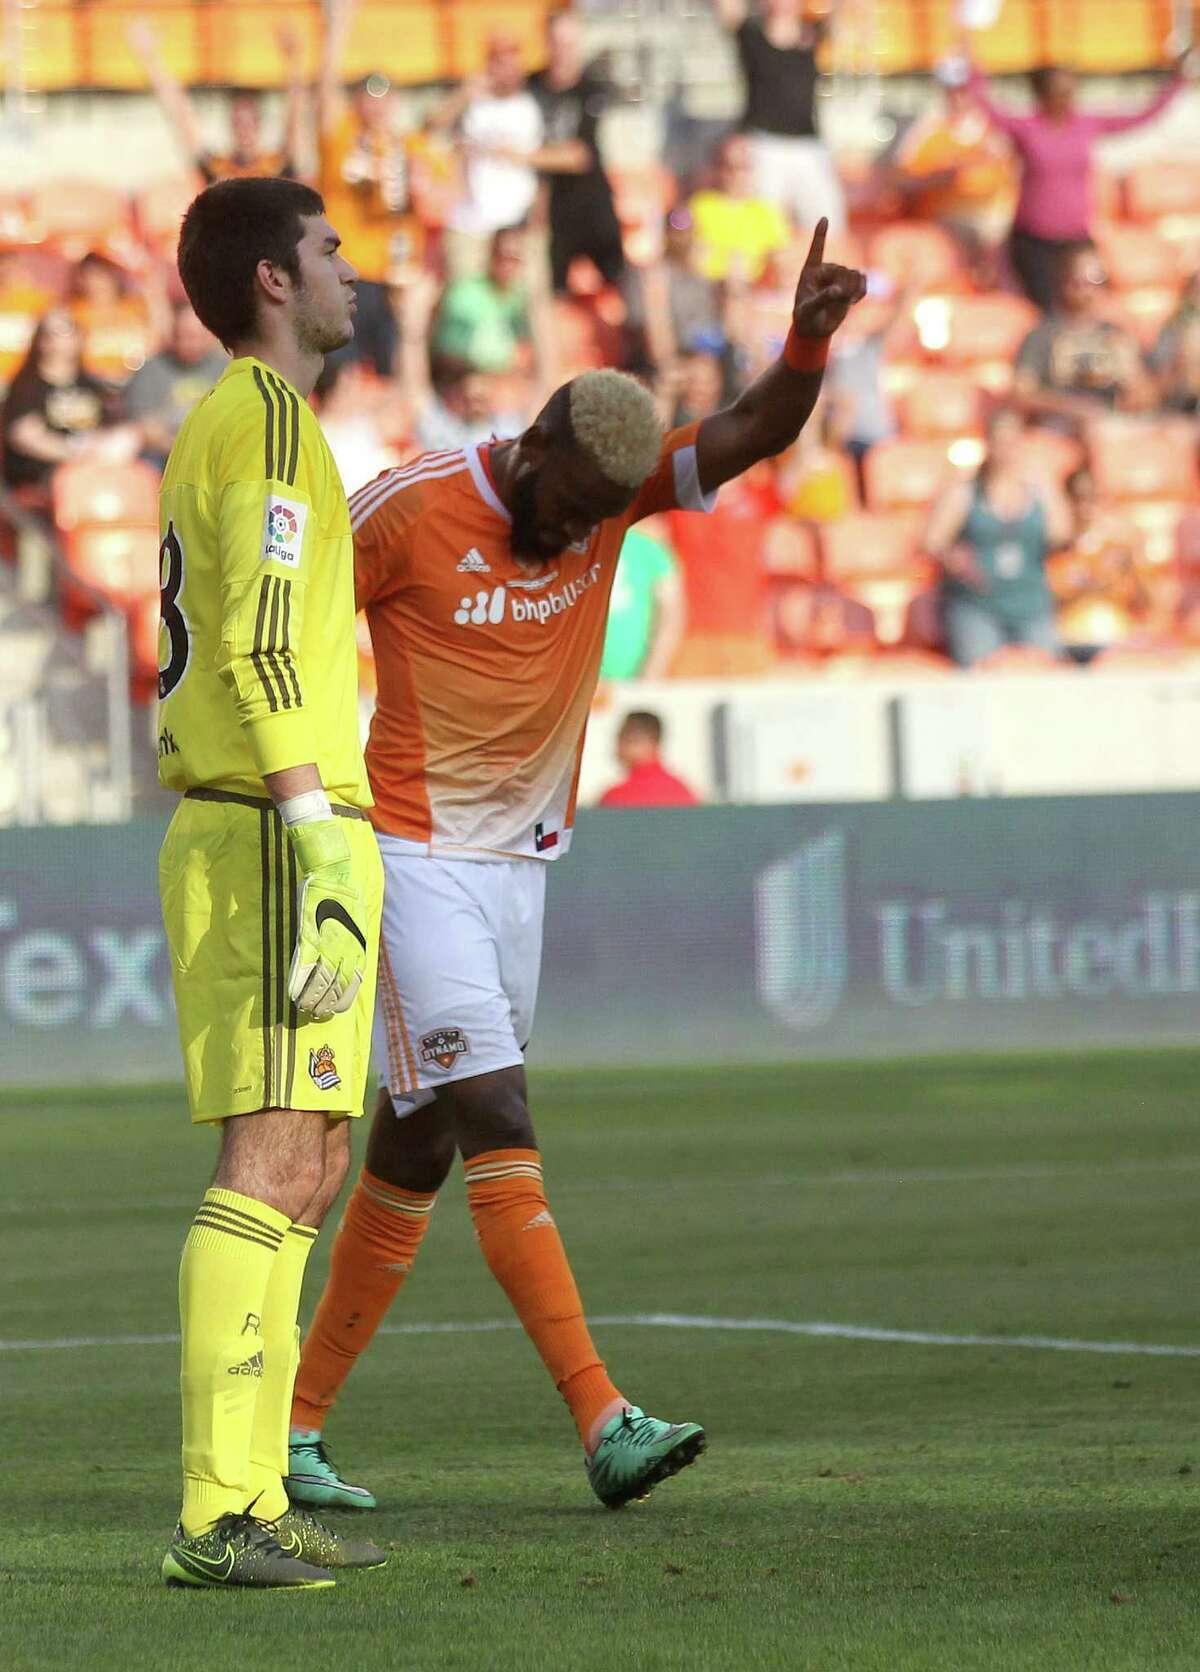 Houston Dynamo defender Sebastian Ibeagha (34) reacts to teammates Houston Dynamo midfielder David Rocha (6) goal in the first half in front of Real Sociedad goalkeeper Andre Bardaji (13) on Tuesday, May 24, 2016, in Houston.